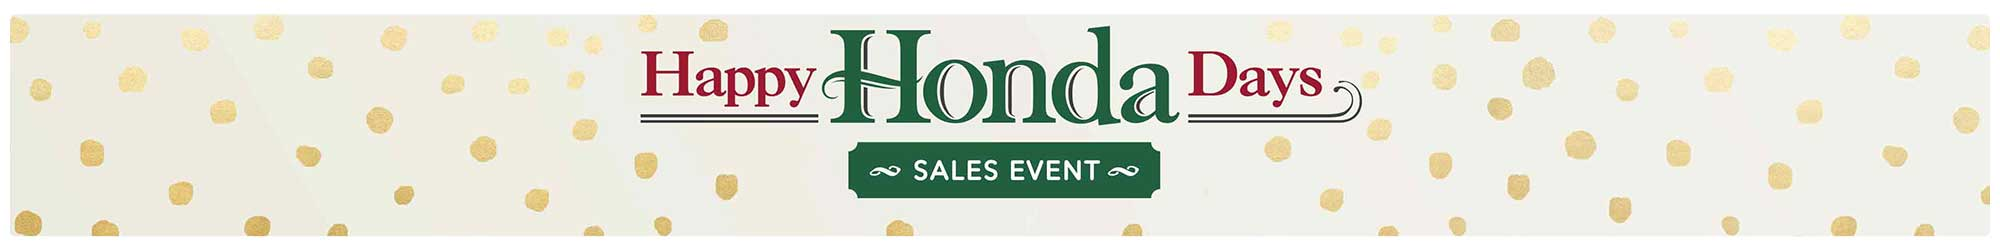 Happy Honda Days Inventory Banner